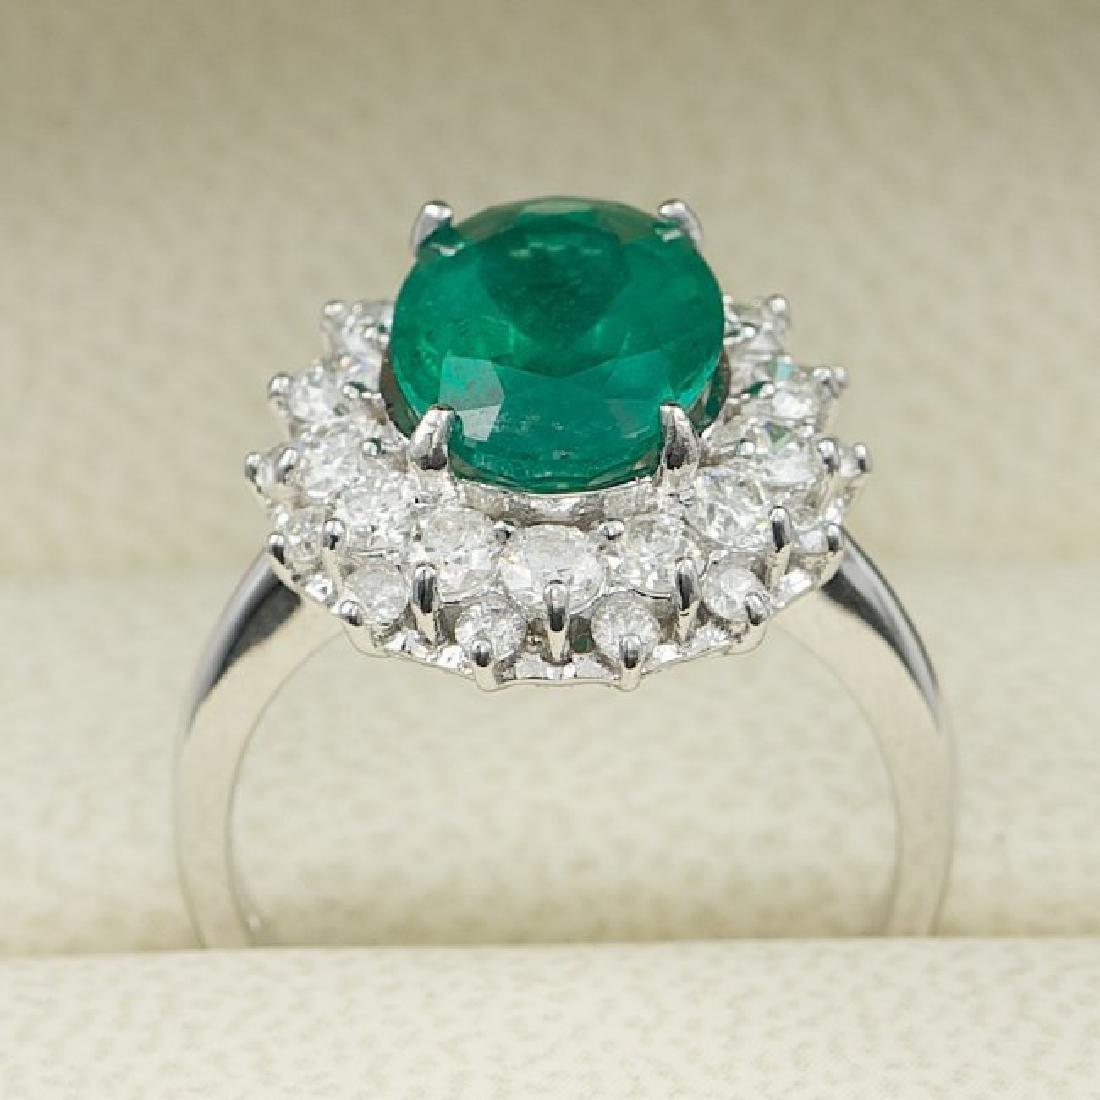 14k White Gold 3.50ct Emerald 1.55ct Diamond Ring - 5